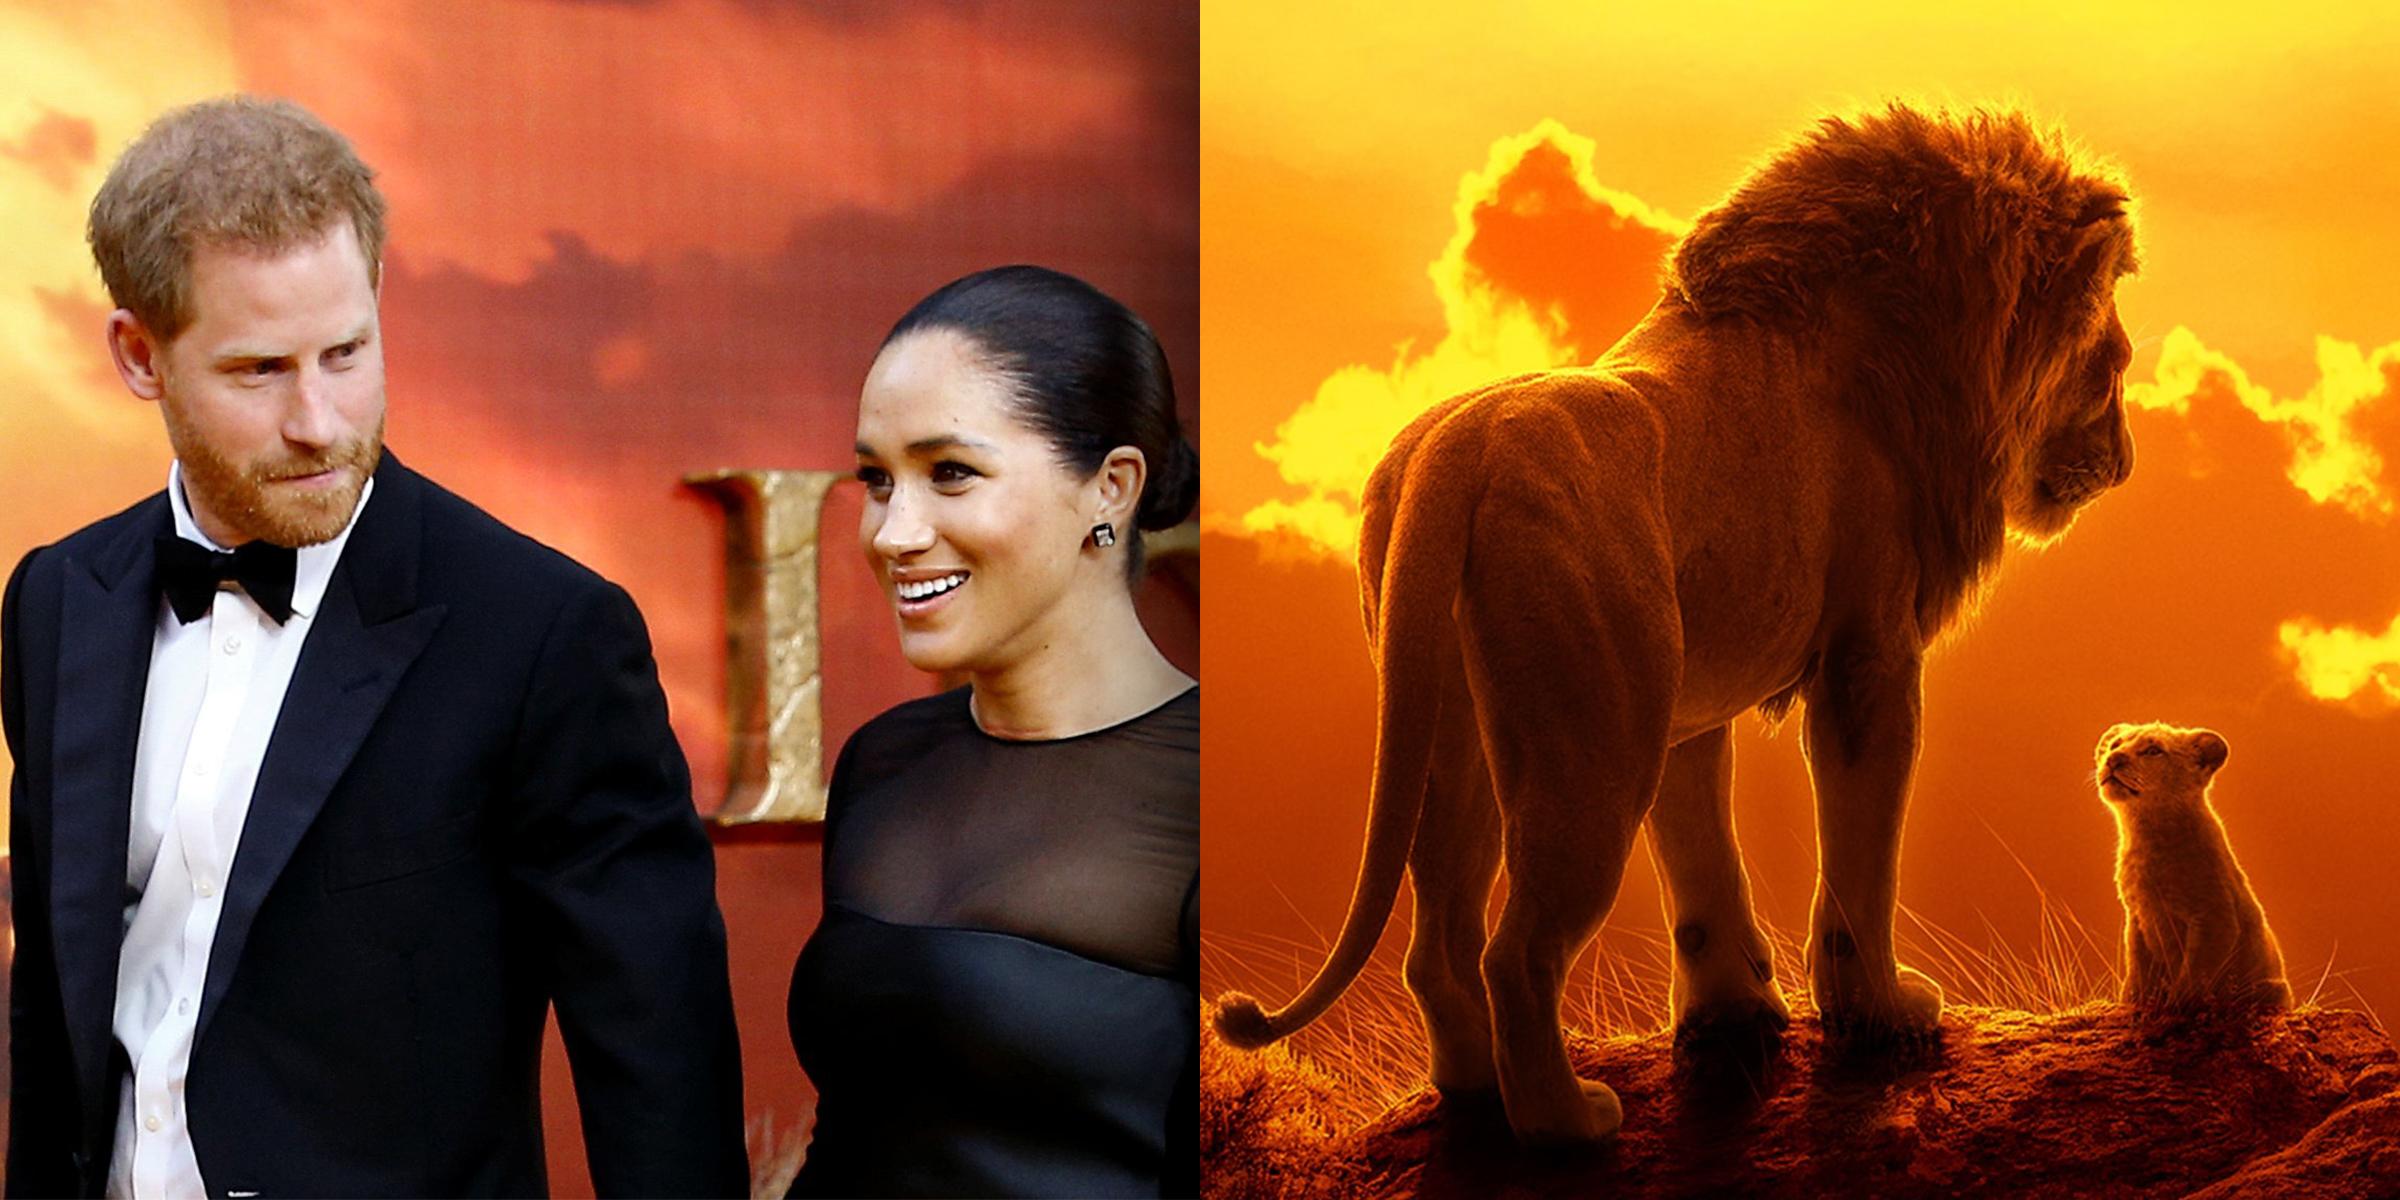 Meghan Markle, Prince Harry arrive at 'Lion King' premiere in London, meet Beyonce